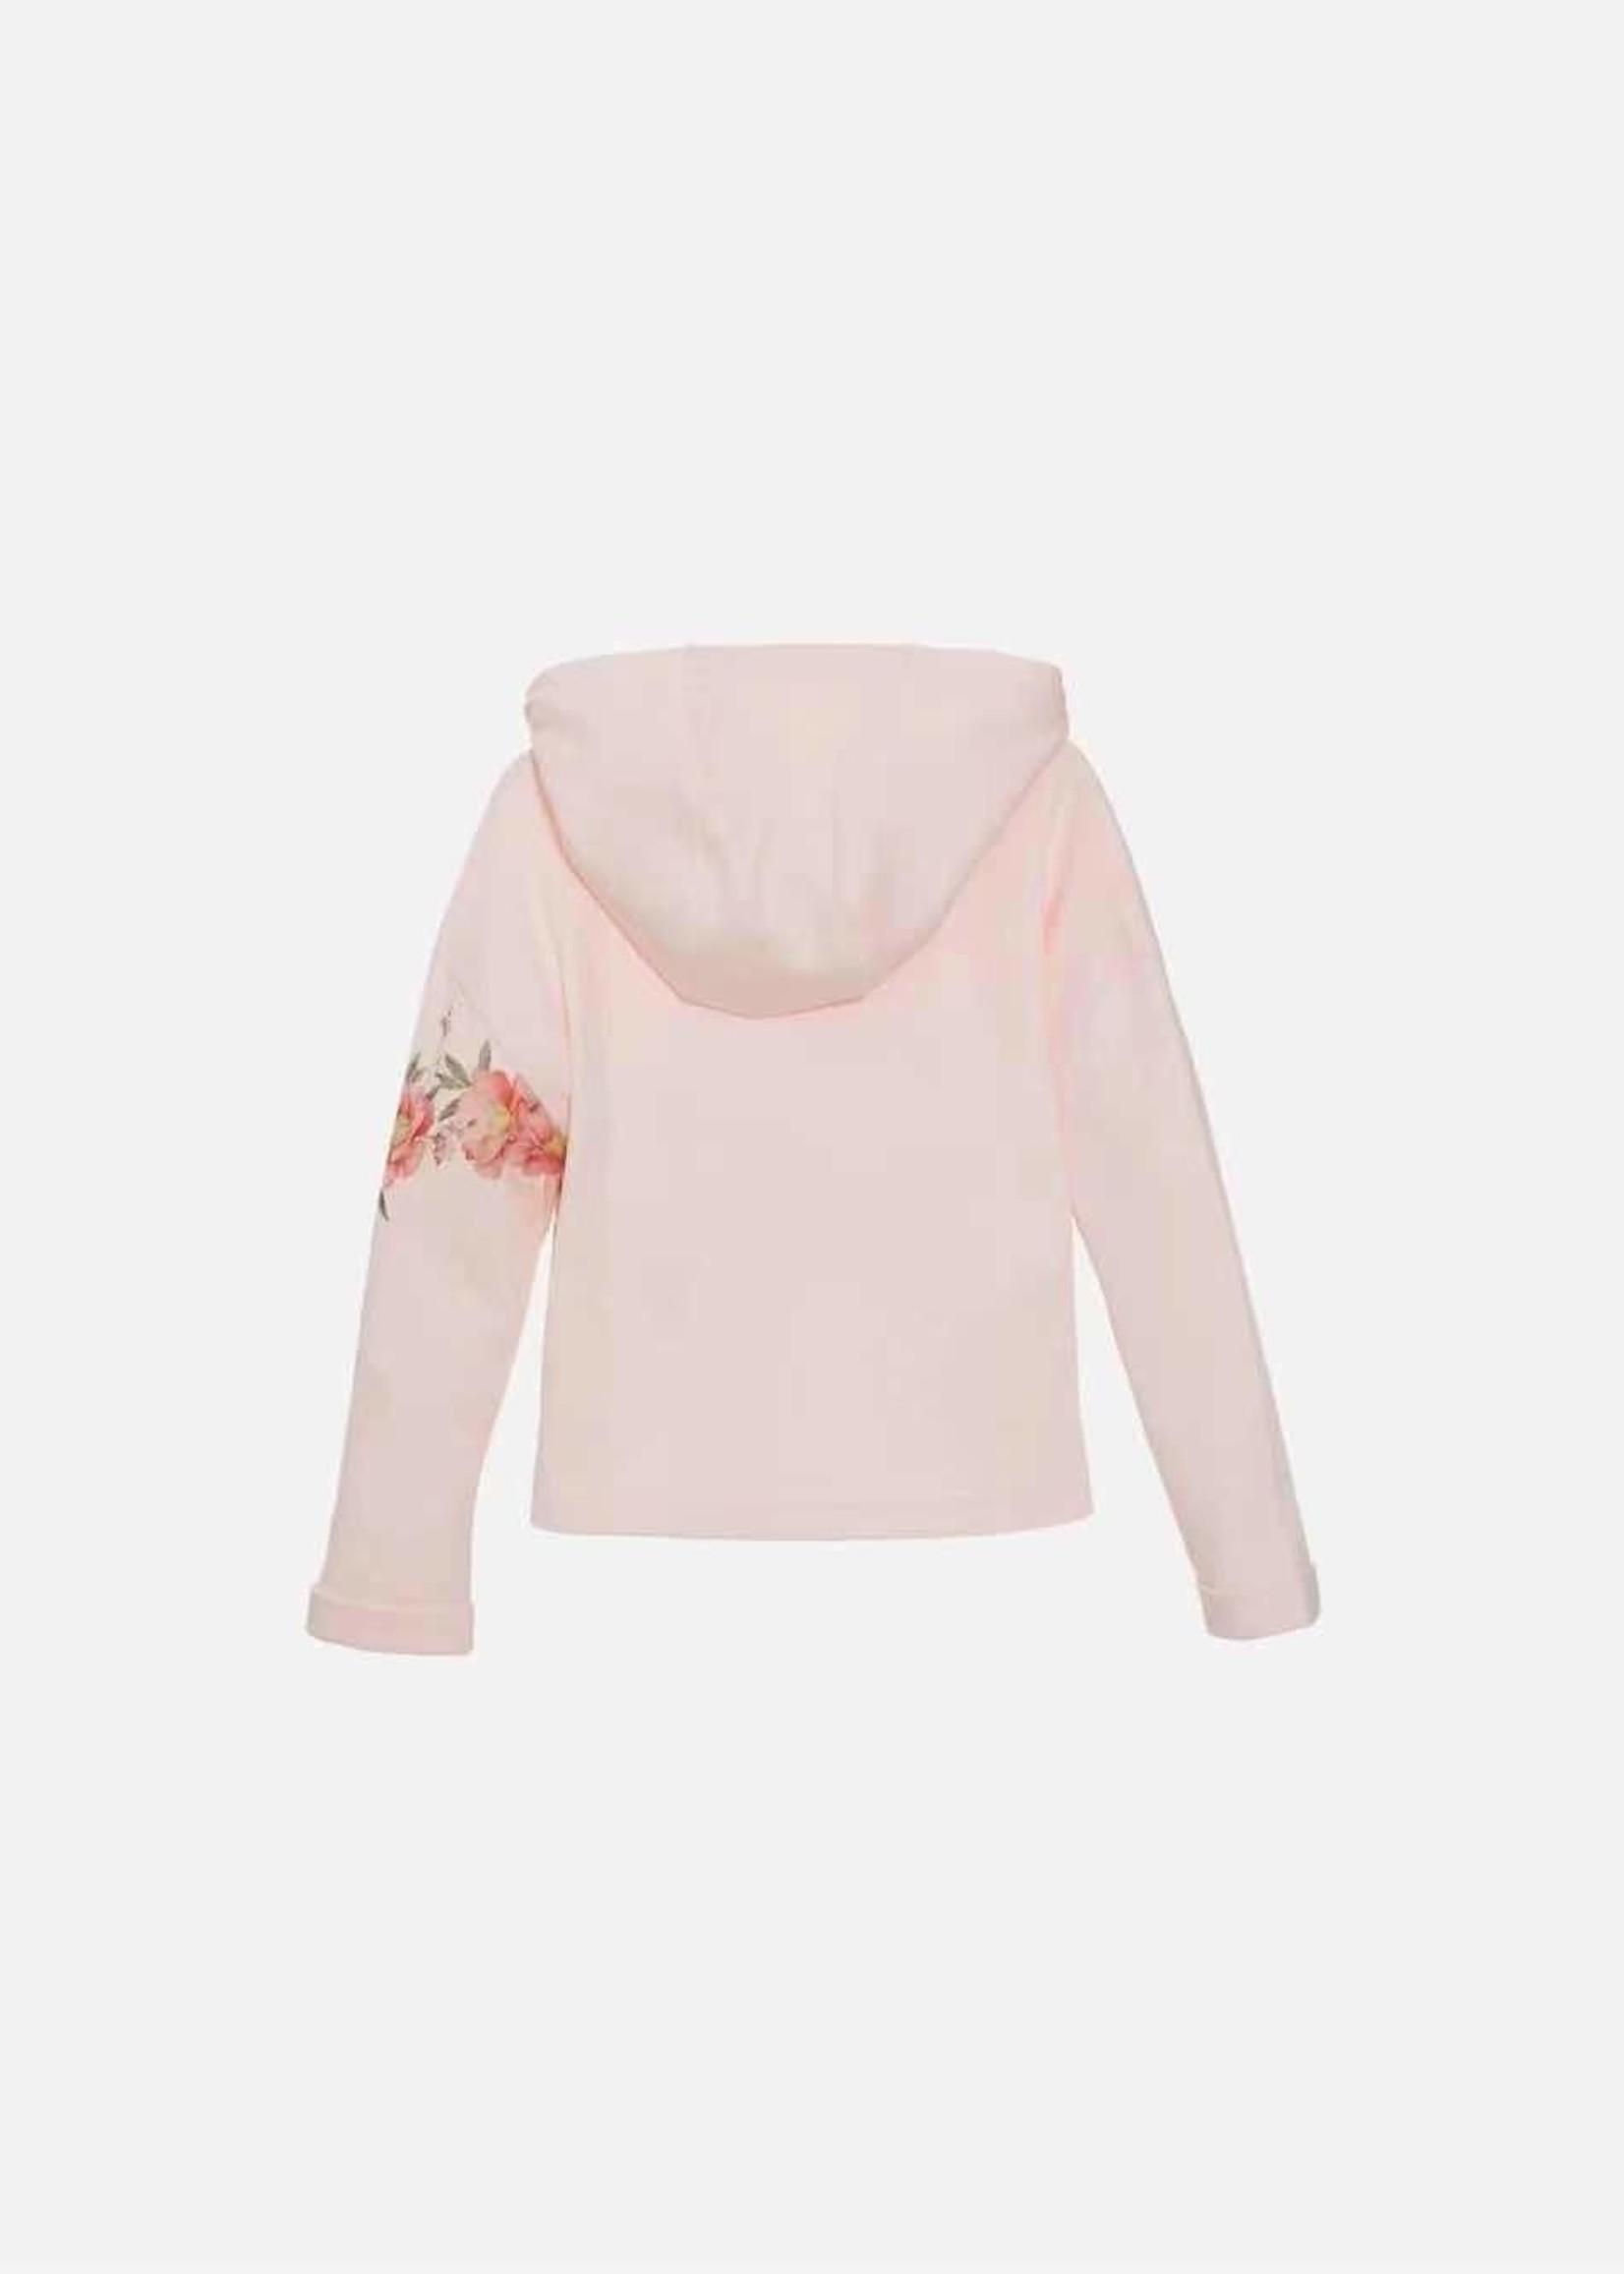 Patachou Patachou-ss213233413 sweaters